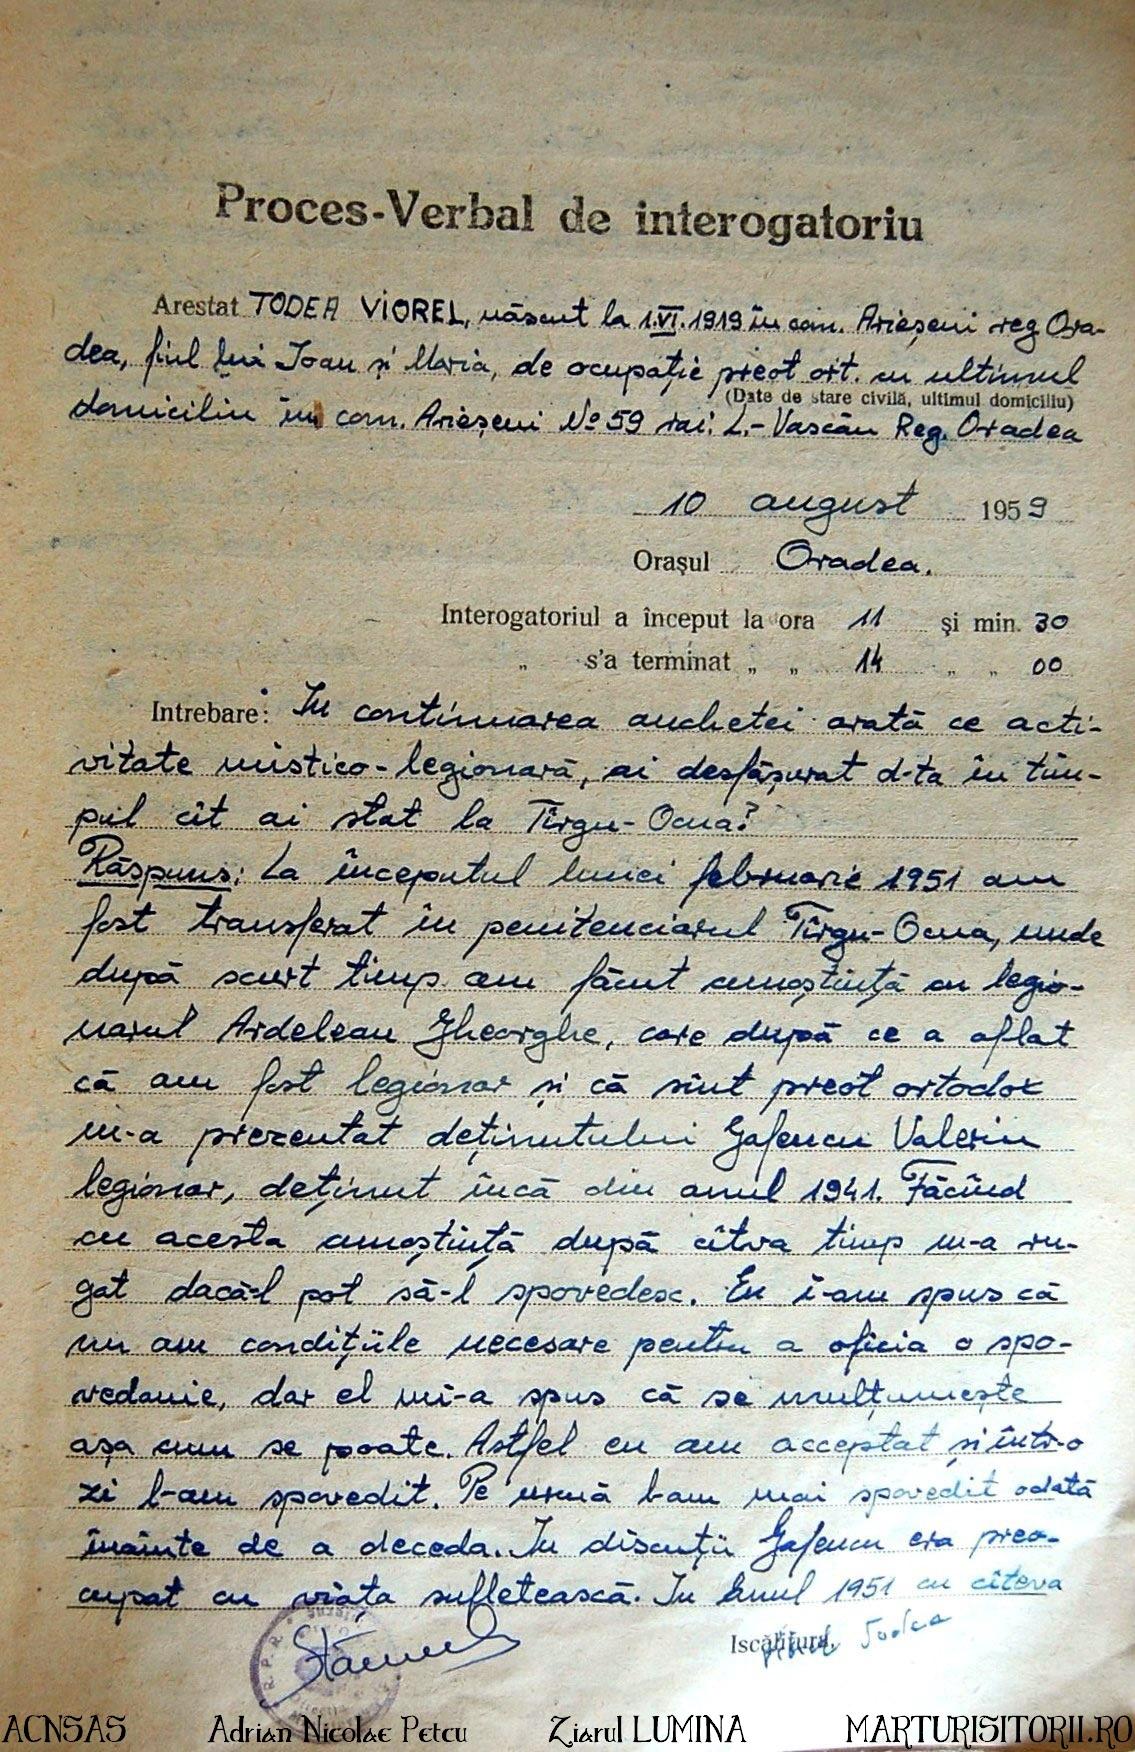 proces-verbal-interogatoriu-1959-v-todea_duhovnicul lui valeriu gafencu